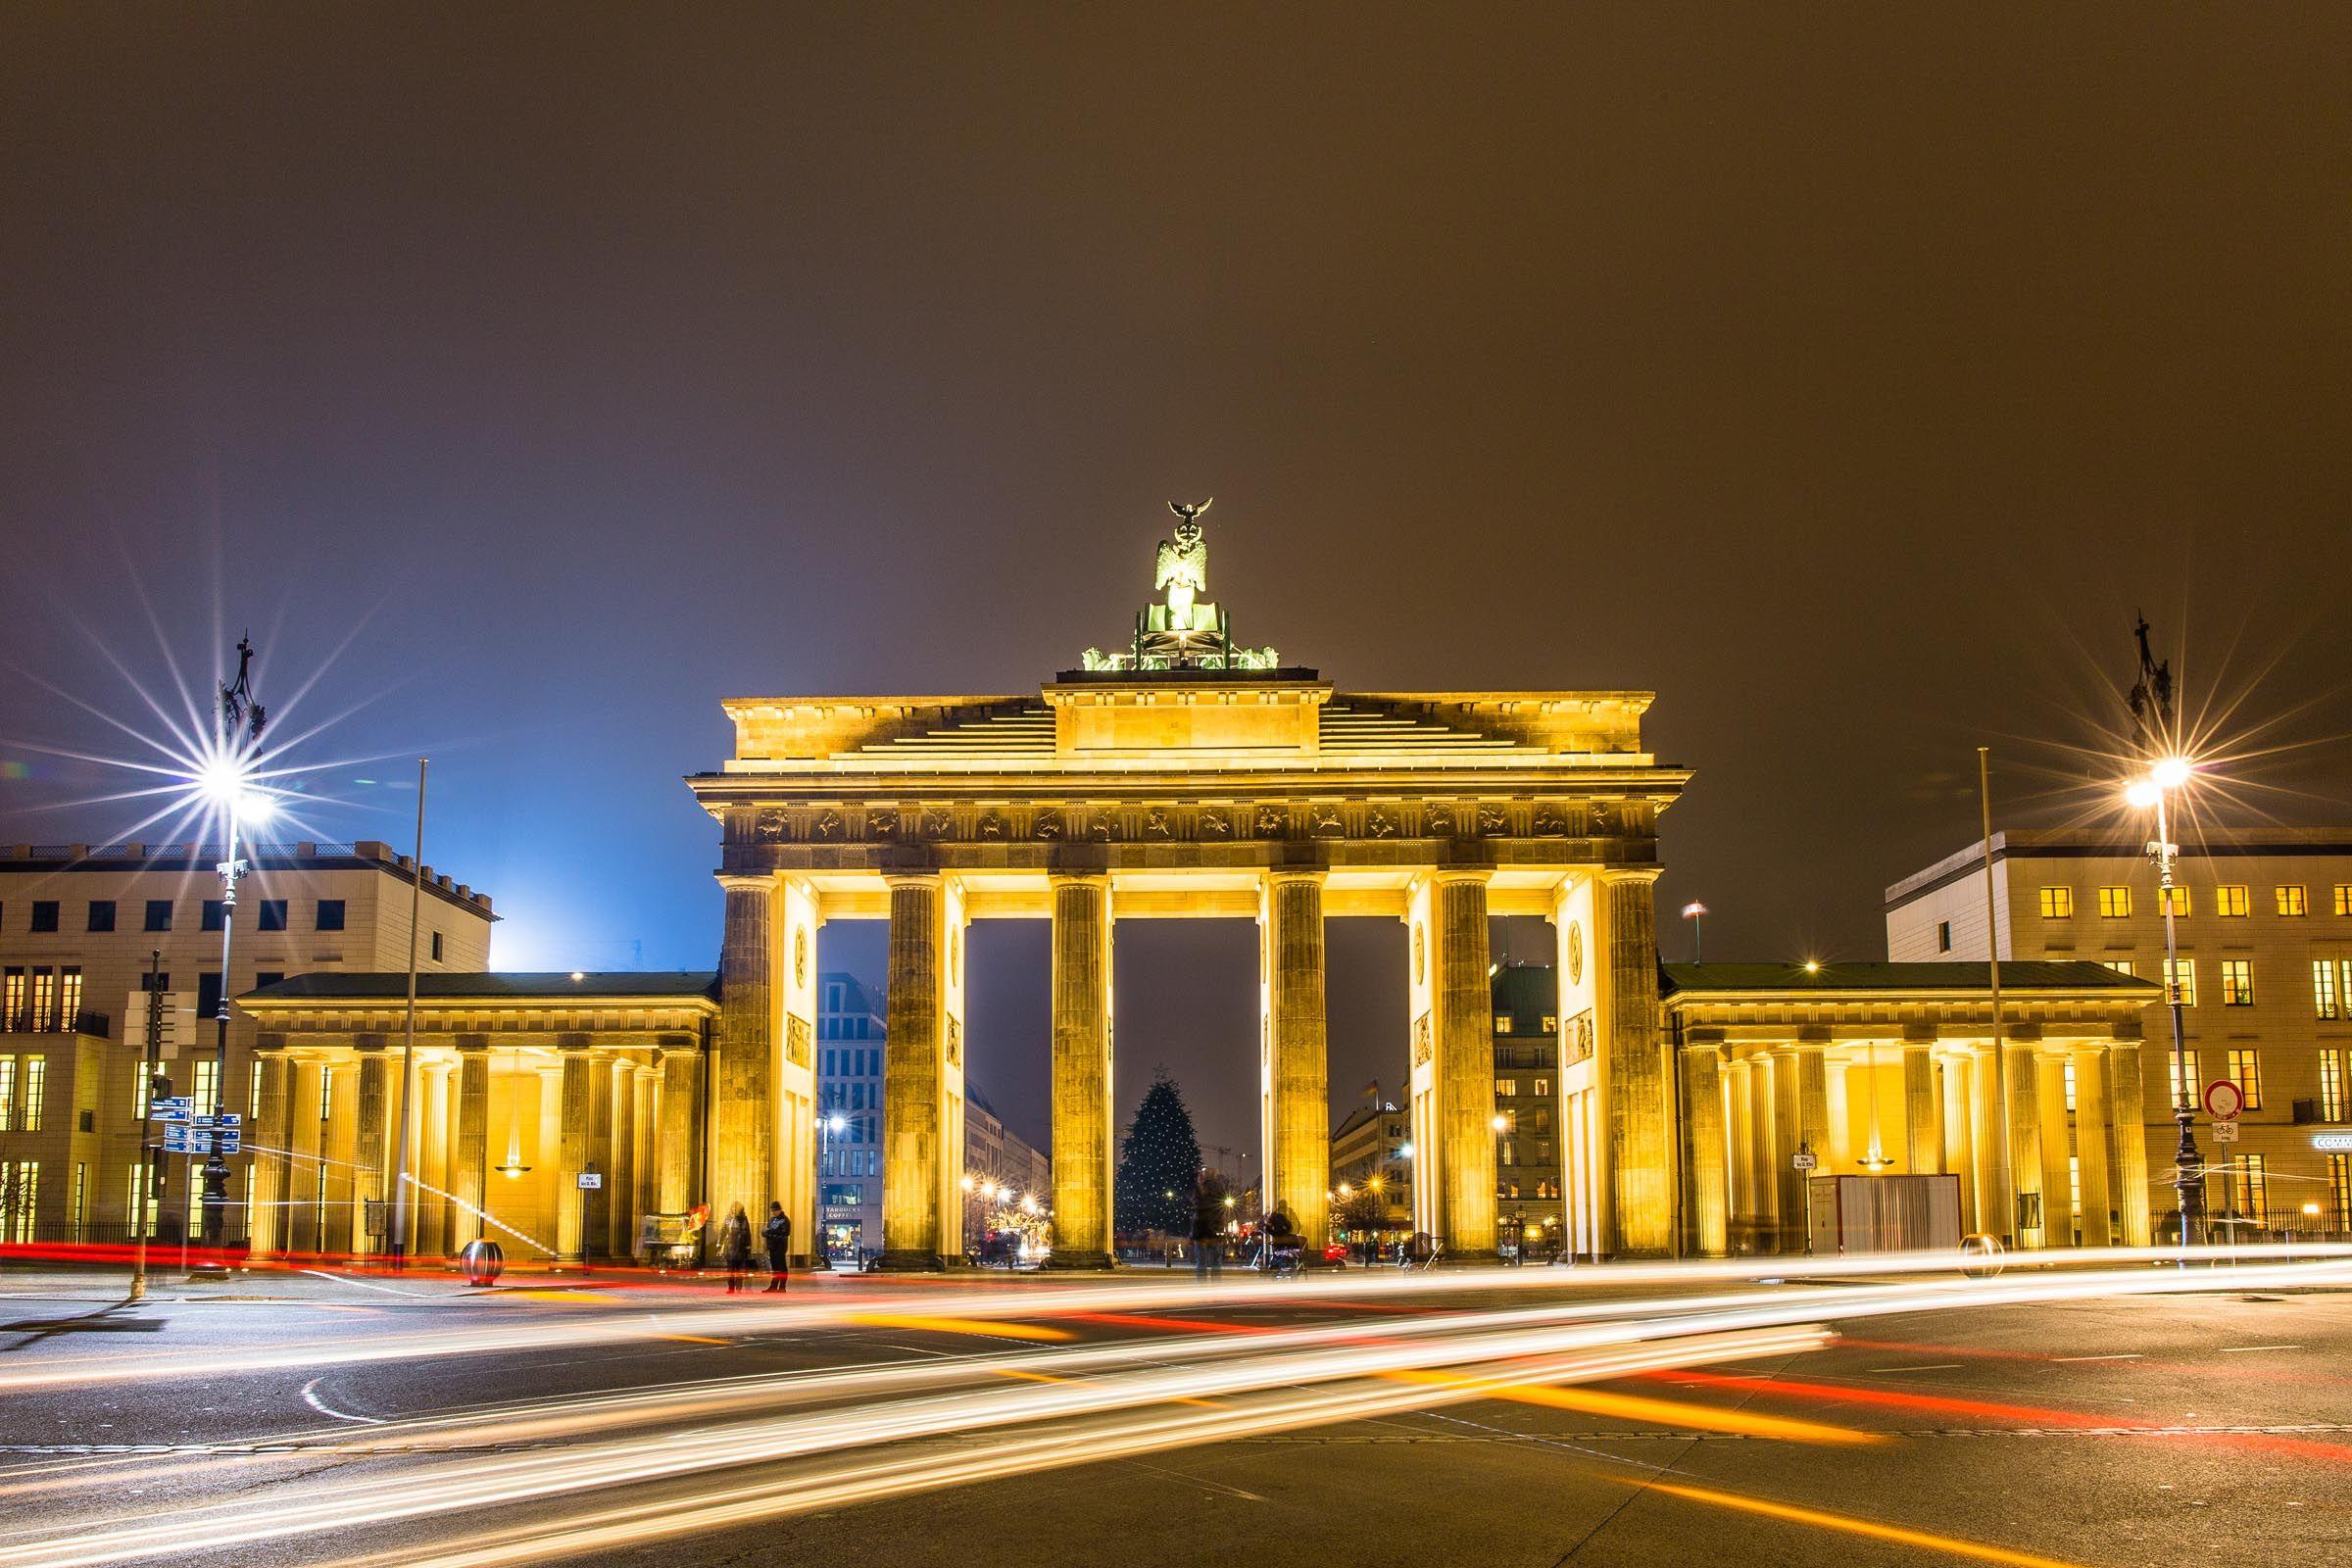 Zehn Beste Foto Orte In Berlin Mit Fotograf Lars Poeck Berlin Tor Brandenburg Gate Brandenburger Nacht Fot In 2020 Berlin Photography Brandenburg Gate House Styles